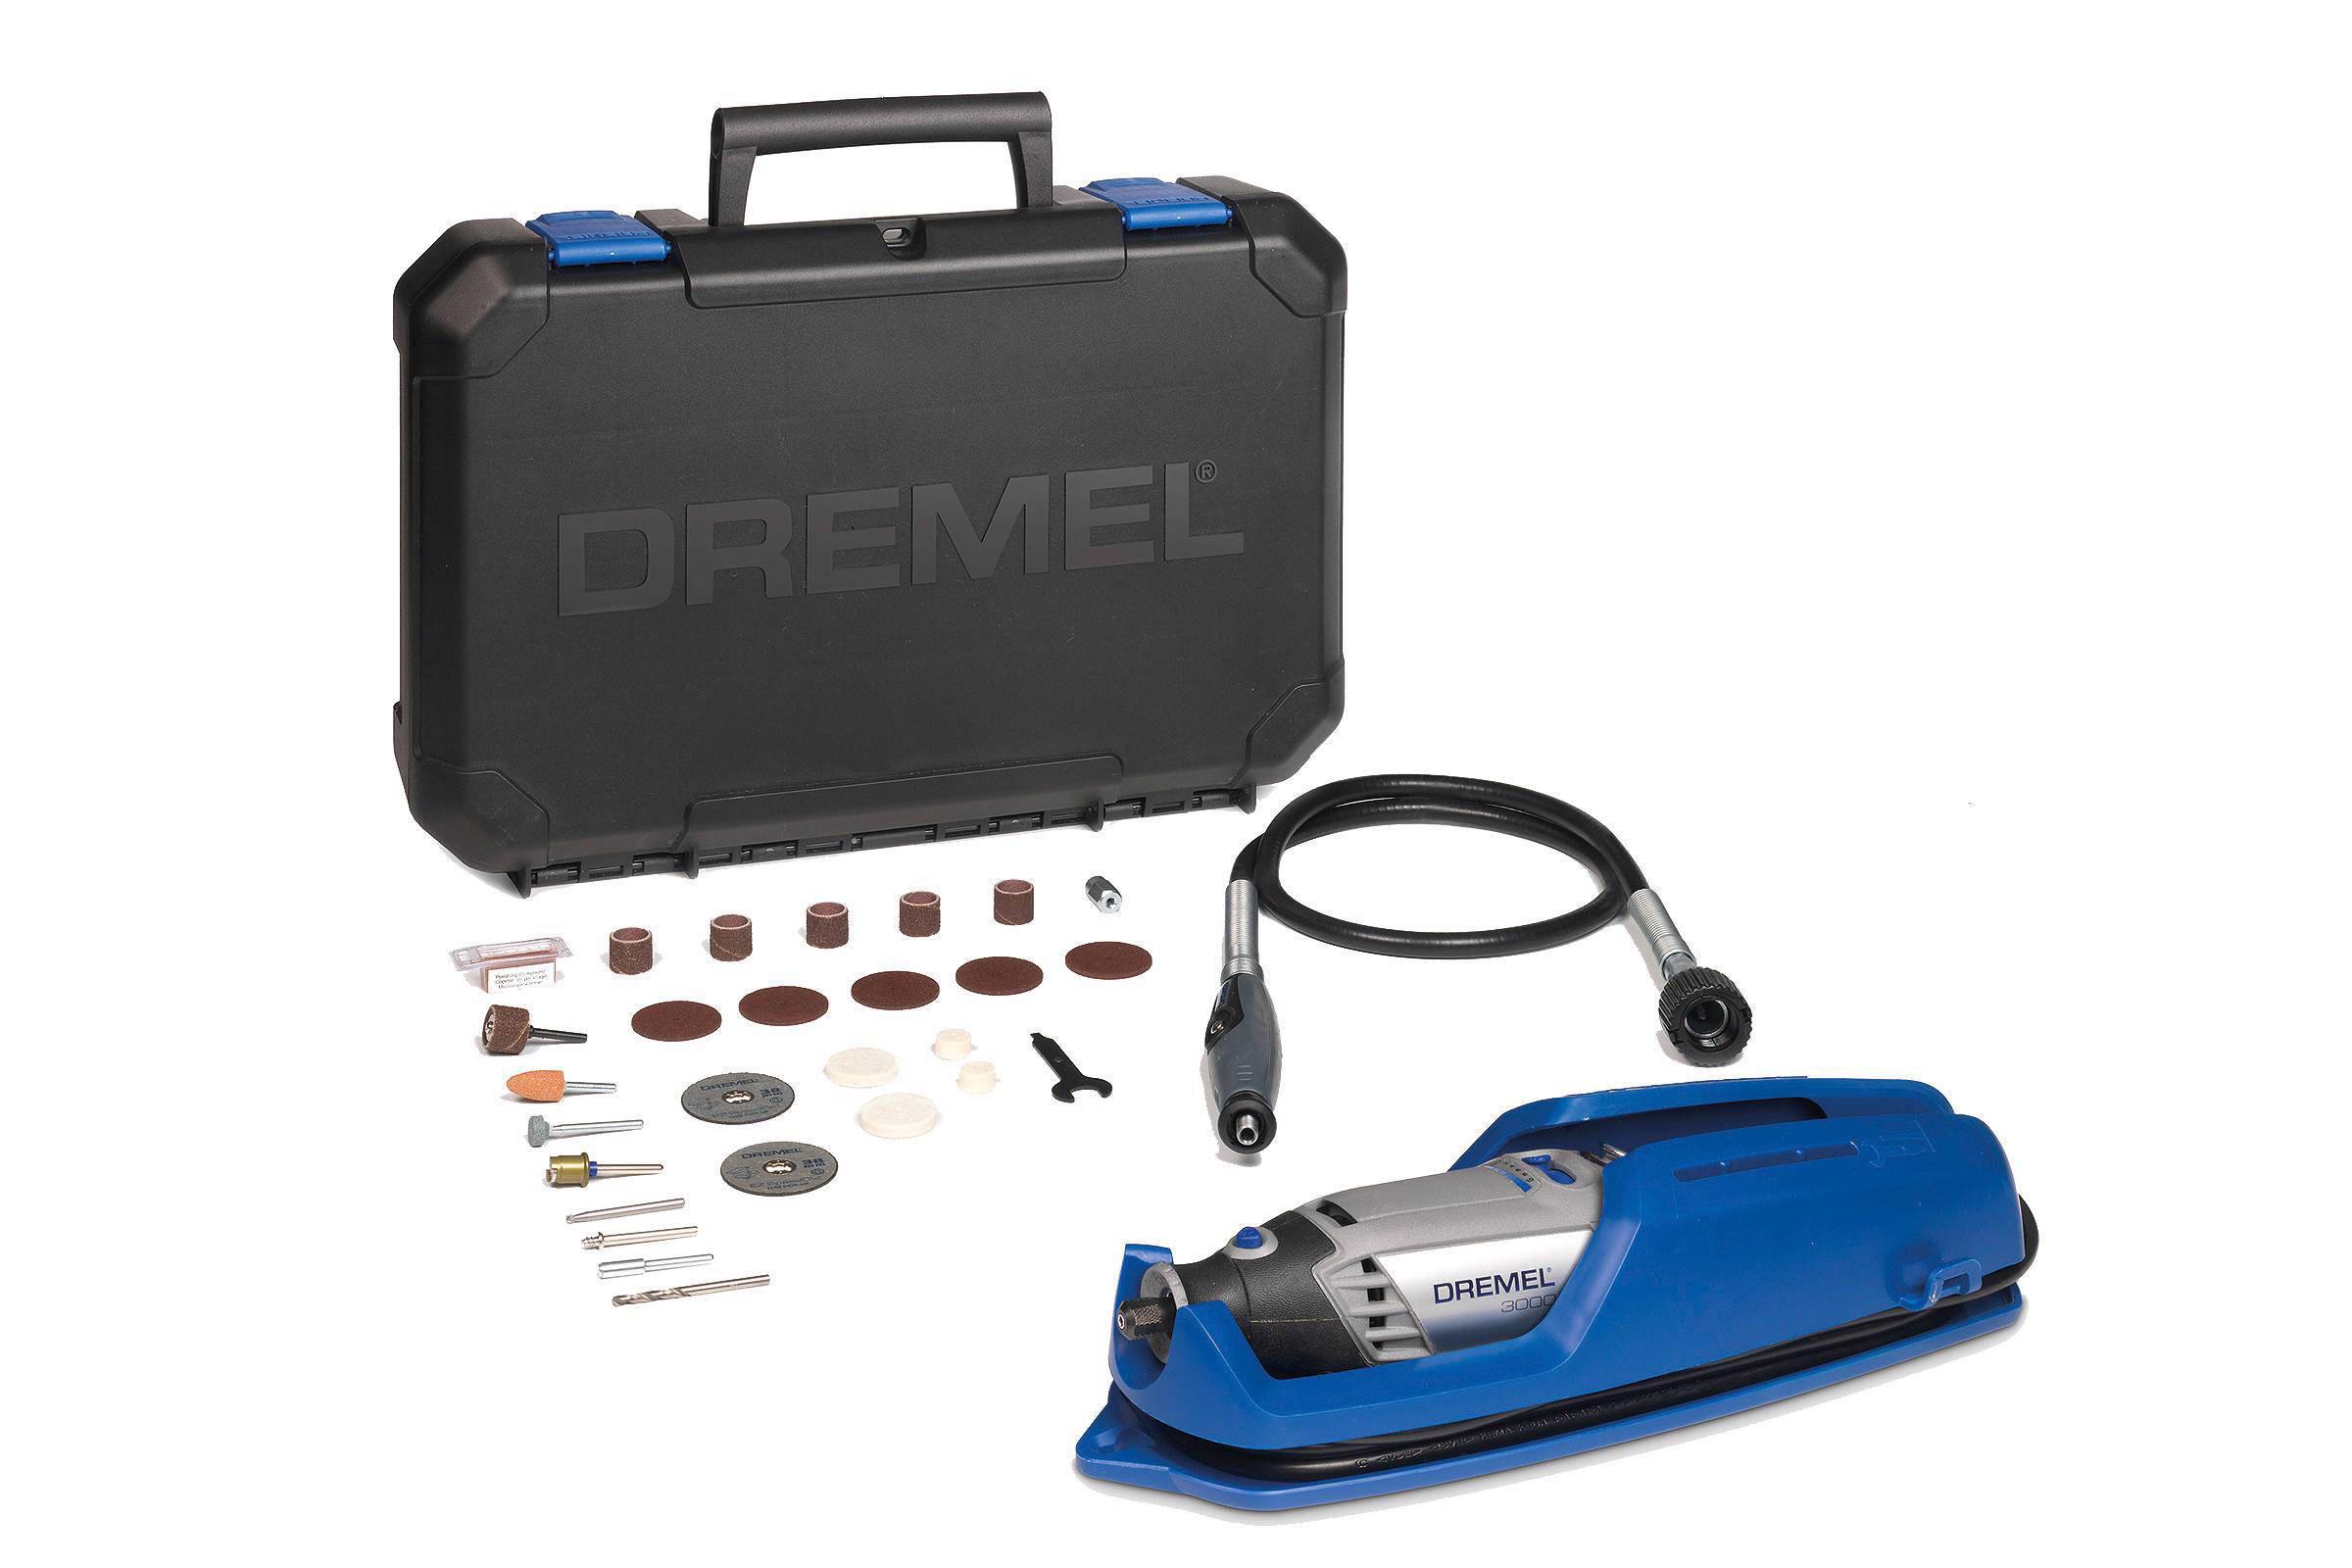 Dremel 3000JP elektrische multitool + accessoireset (25st)